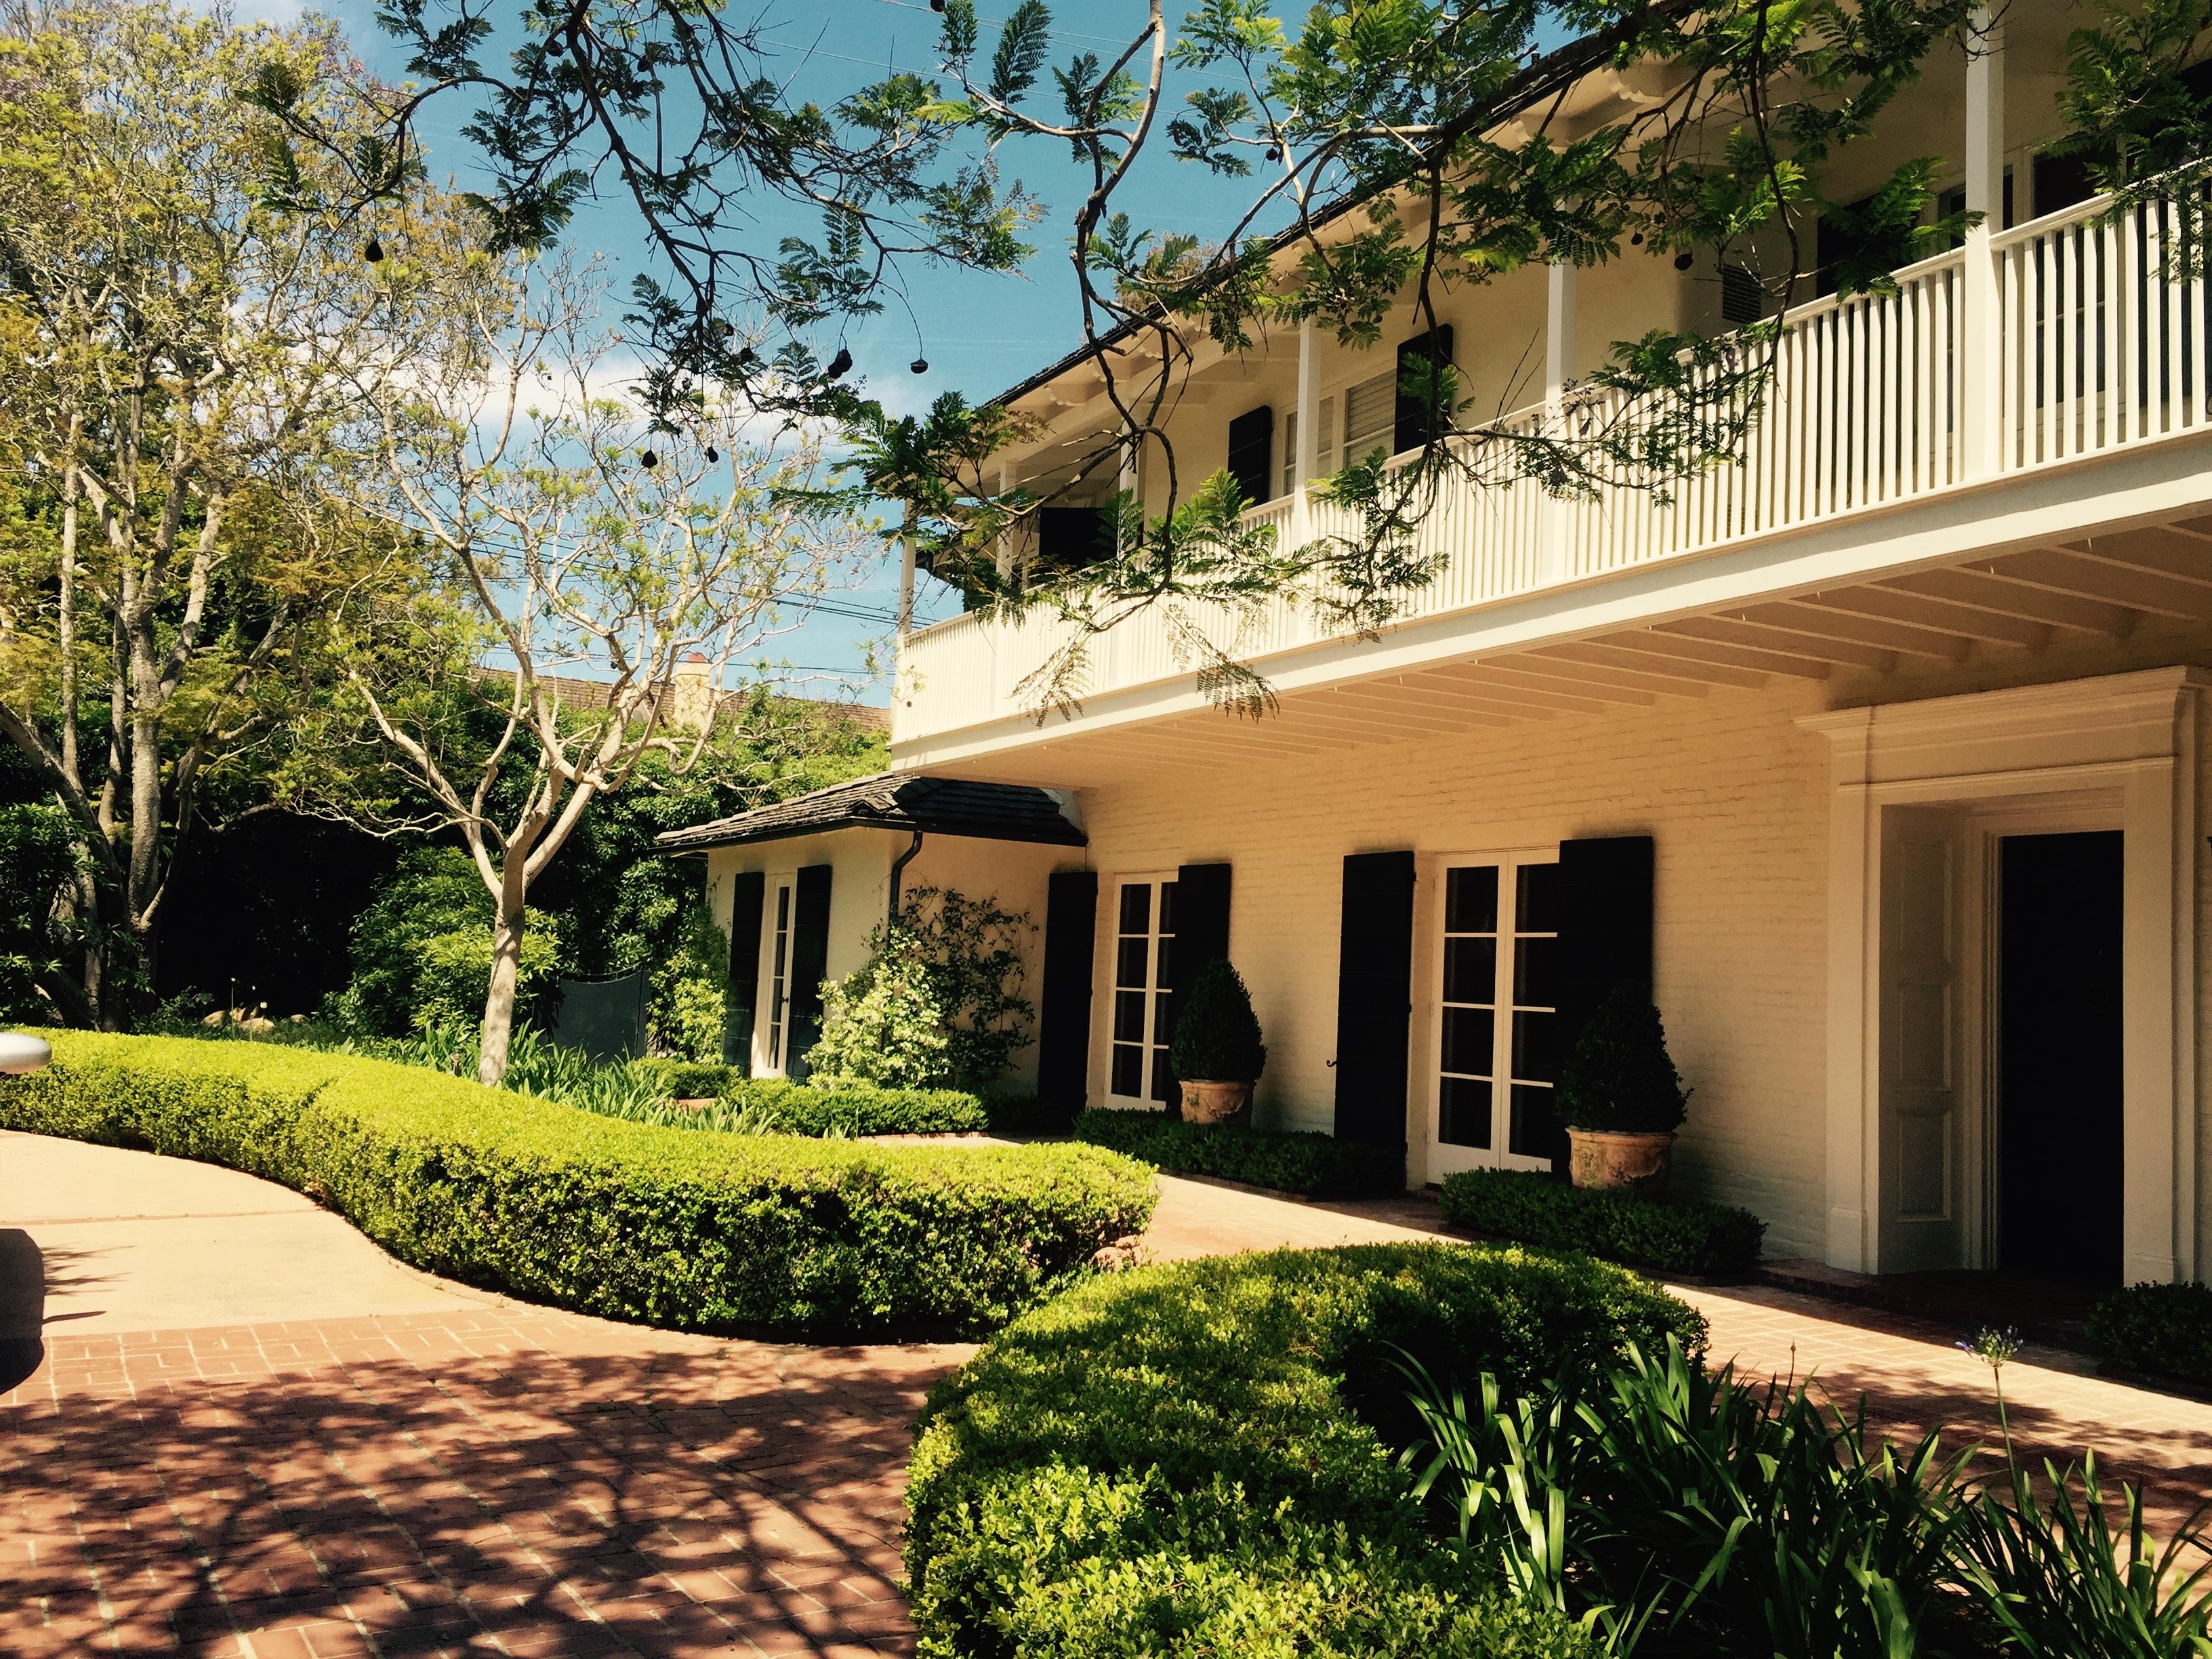 Garden update on the Monterey Colonial in Montecito!